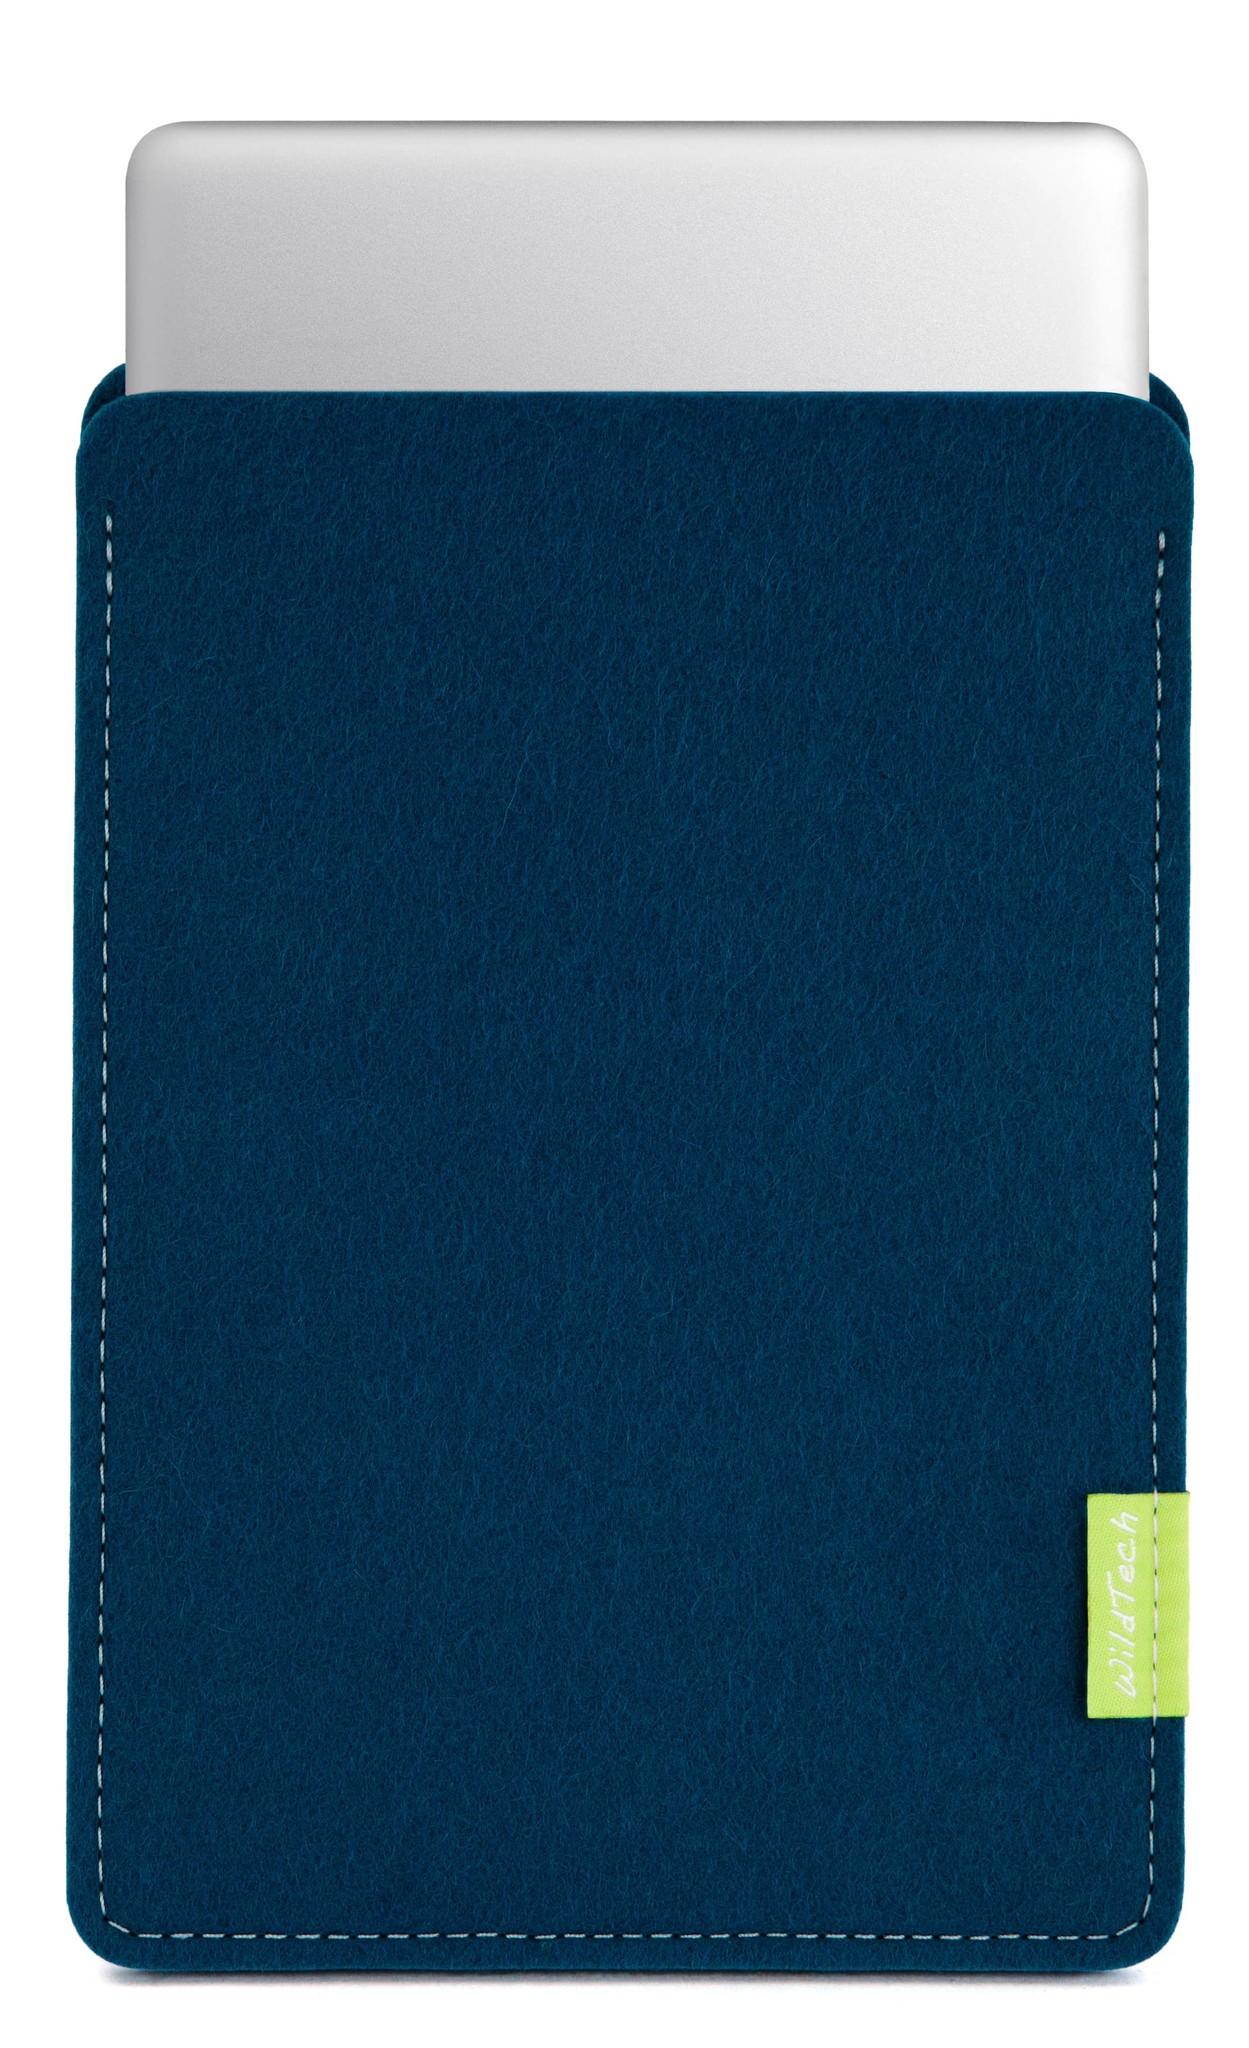 MacBook Sleeve Pazifikblau-1